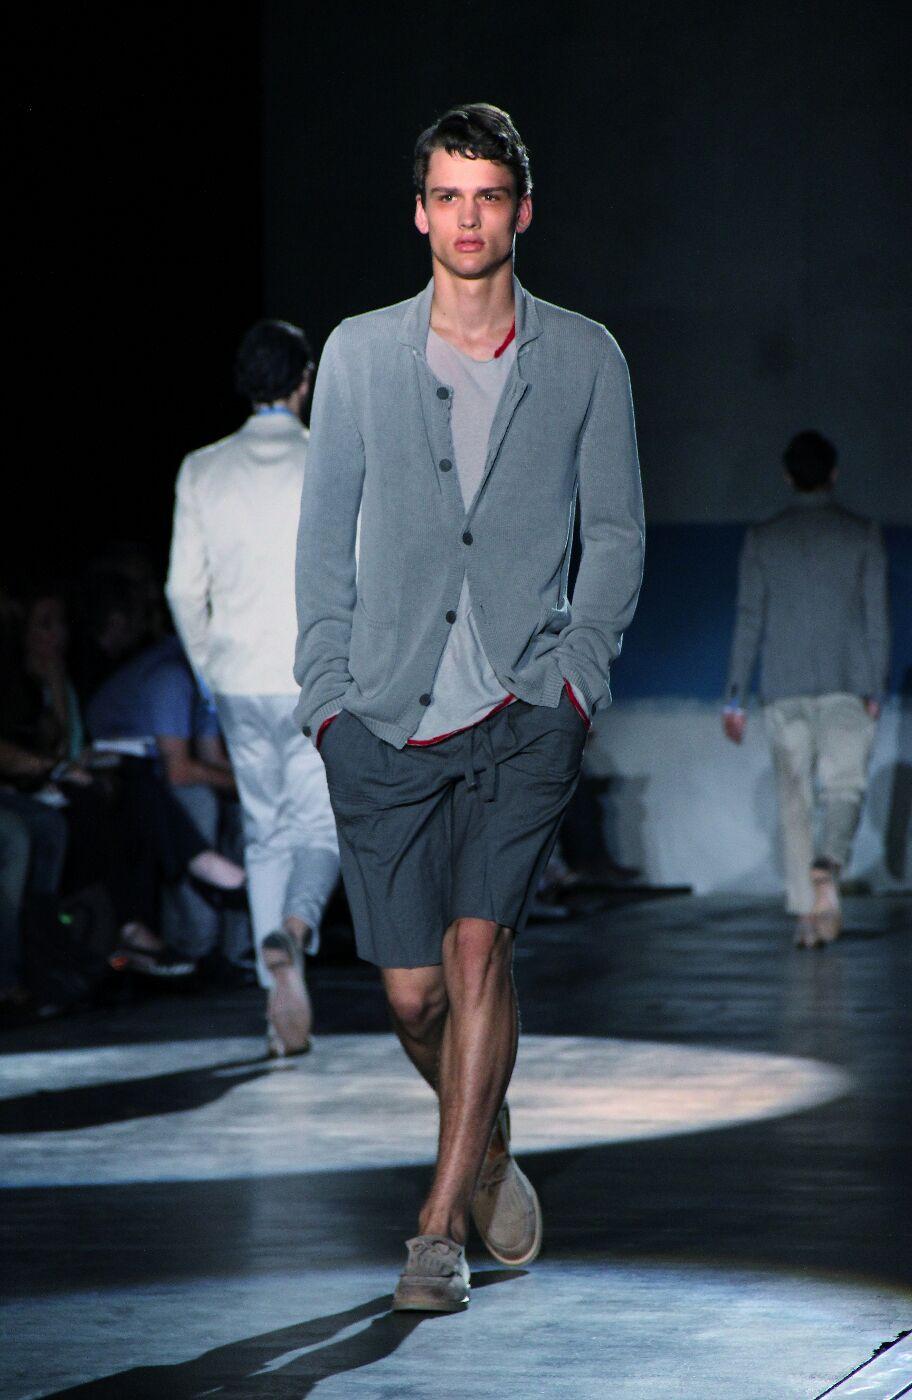 spring-summer-iceberg-2012-men-collection-milano-fashion-week-2012-iceberg-fashion-show-catwalk